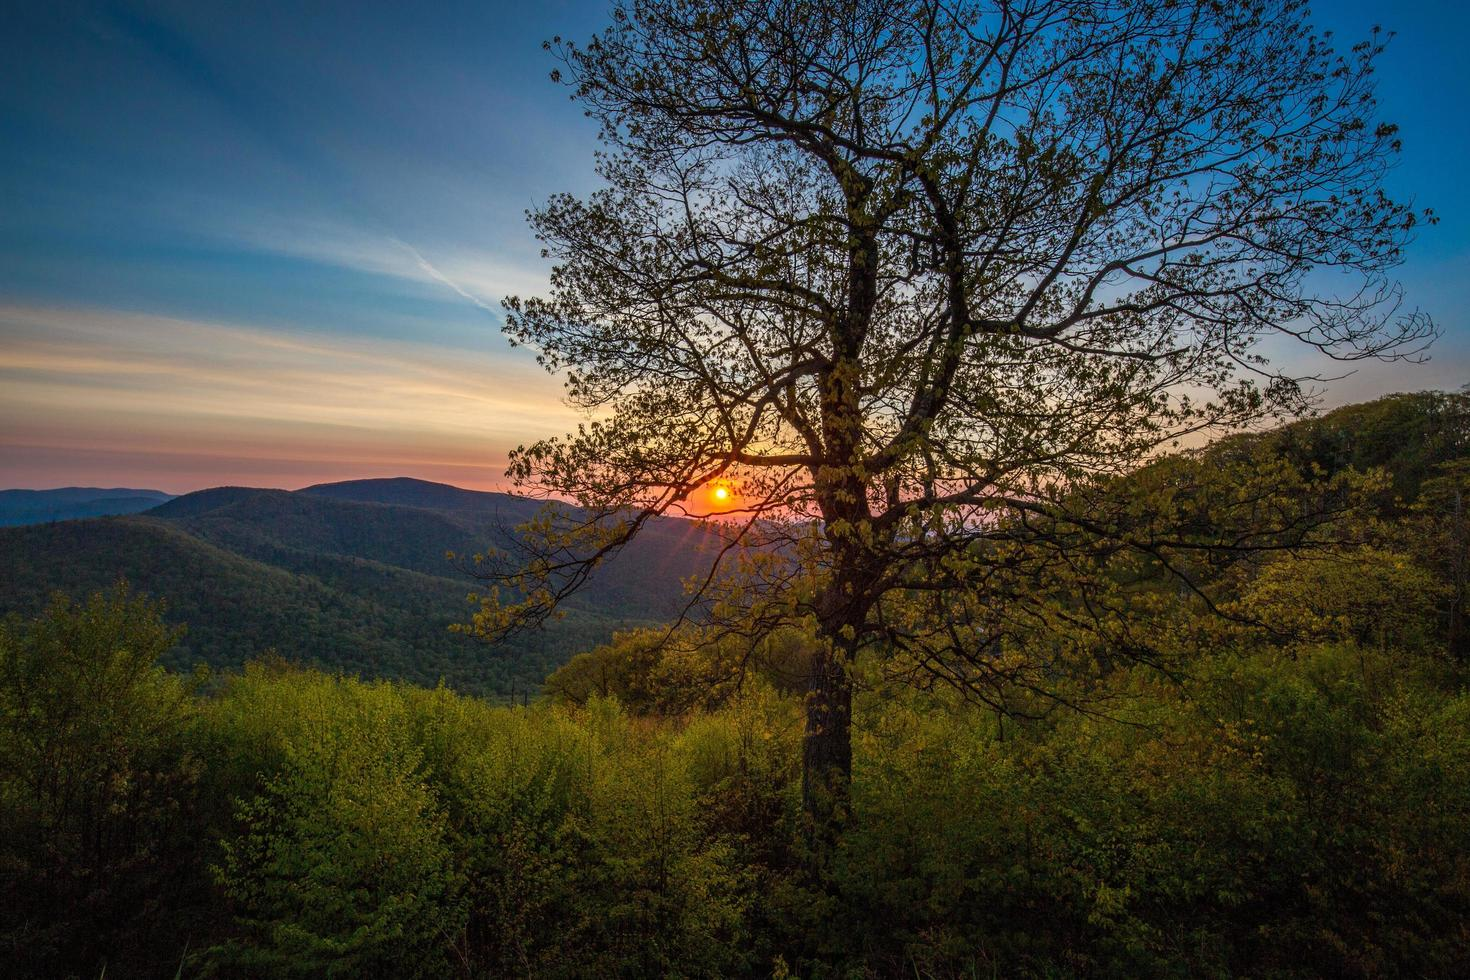 Sonnenaufgang im Shenandoah Nationalpark in Virginia foto